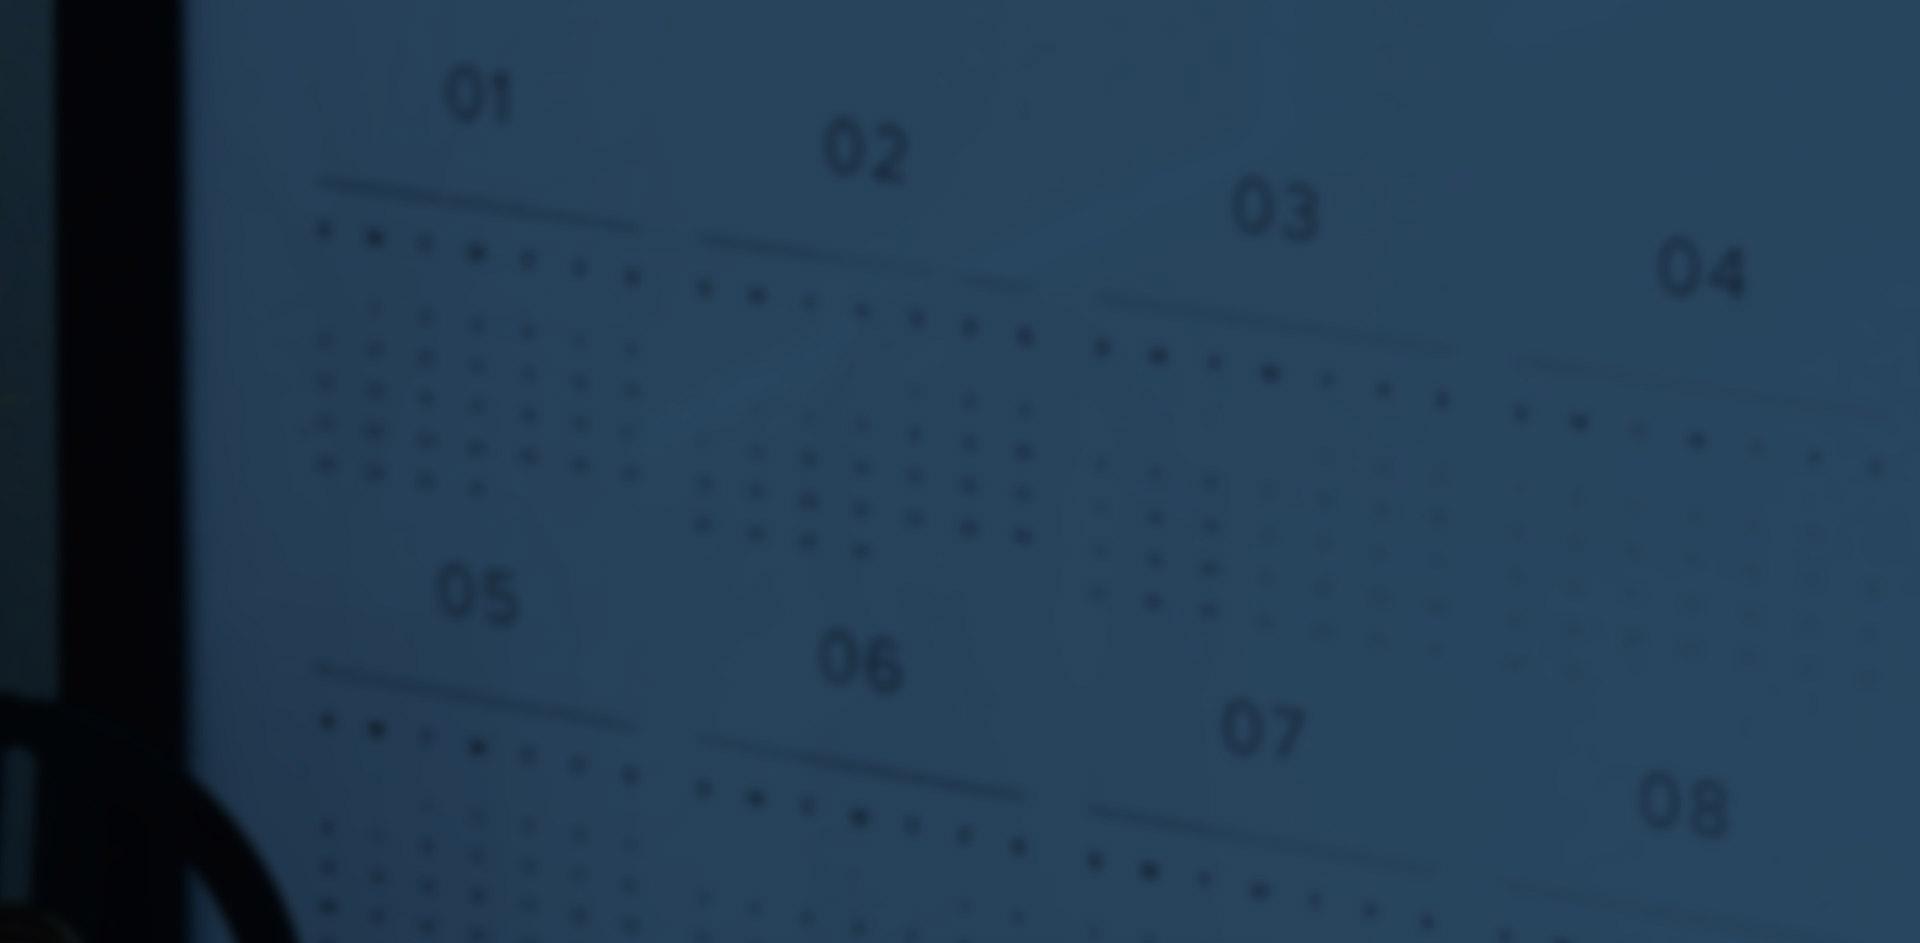 Calendario Finanziario - Investor Relations